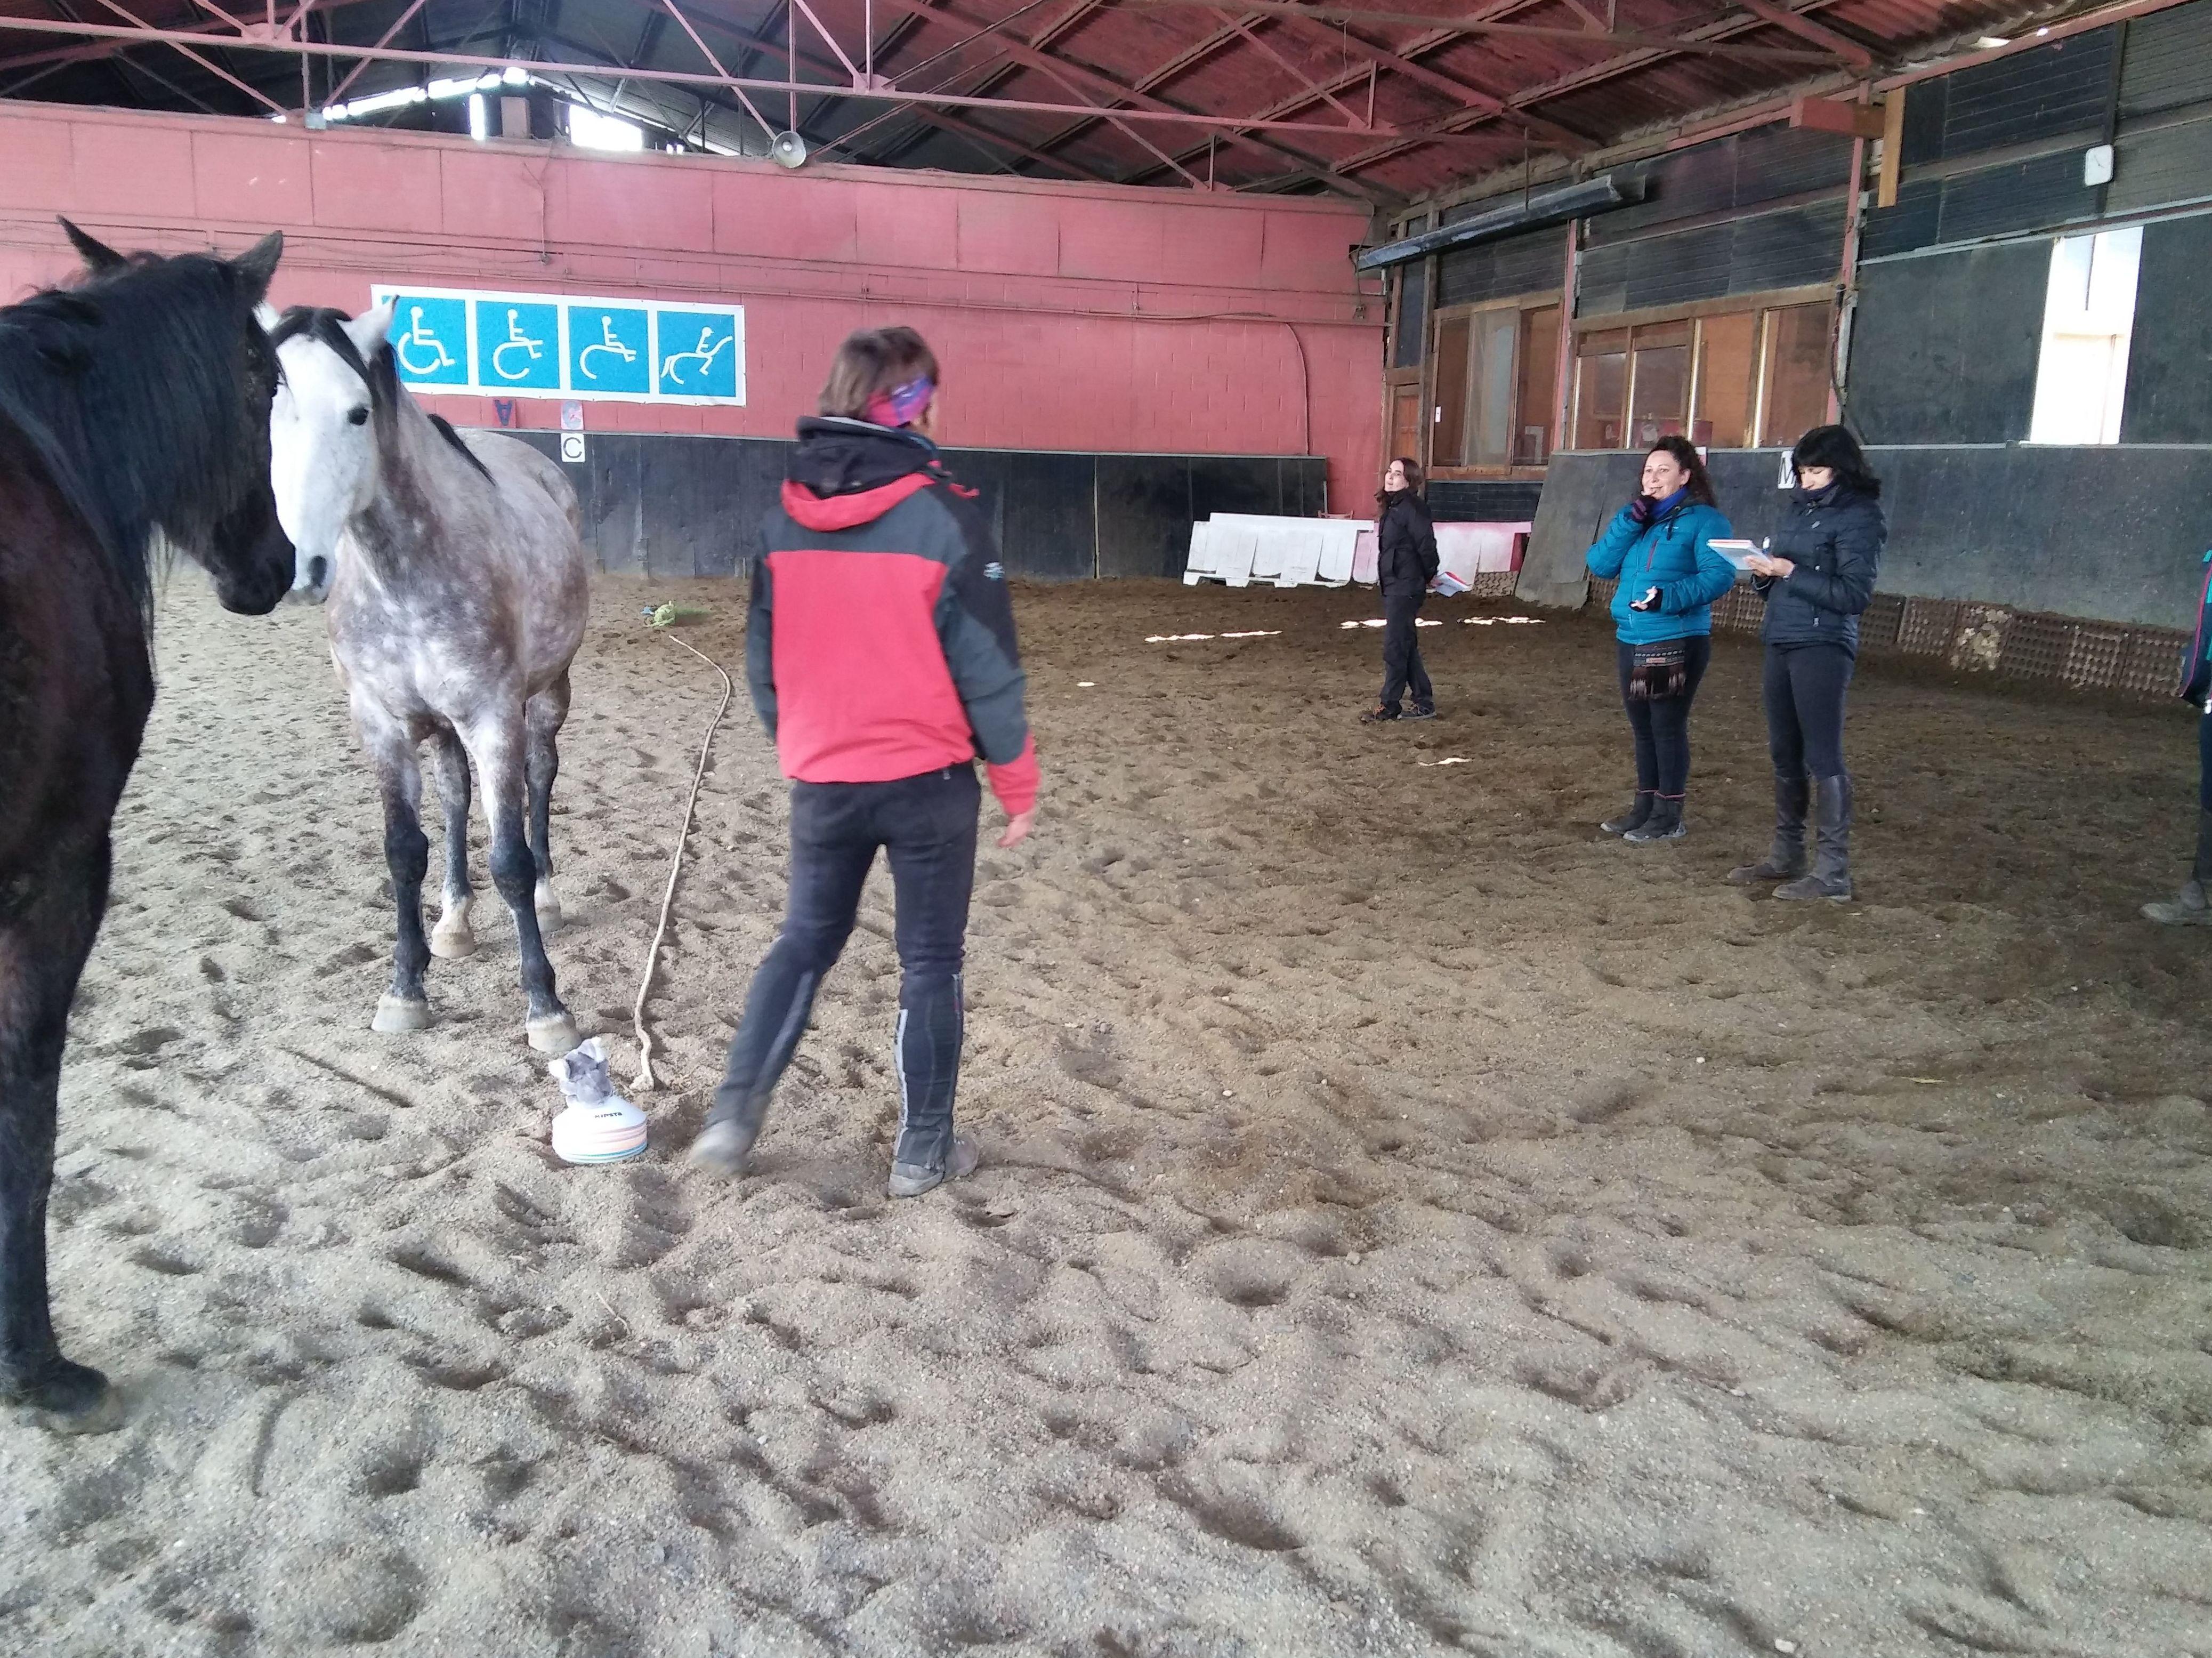 Aprendizaje con caballos: Servicios de Centro de Equitación y Equinoterapia Biki Blasco